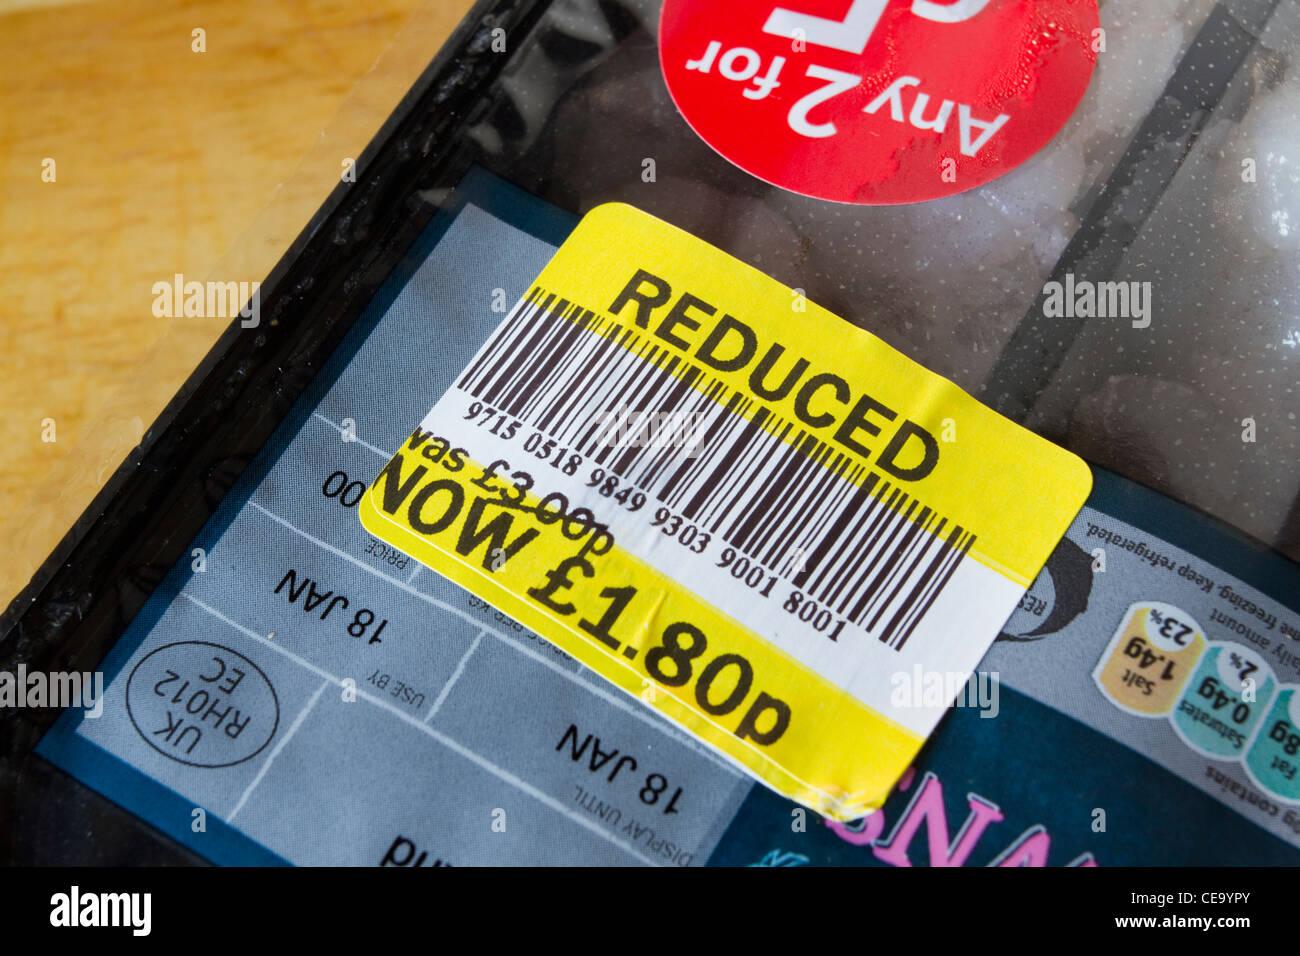 Sainsburys supermarket reduced food discount sticker.  England, UK - Stock Image